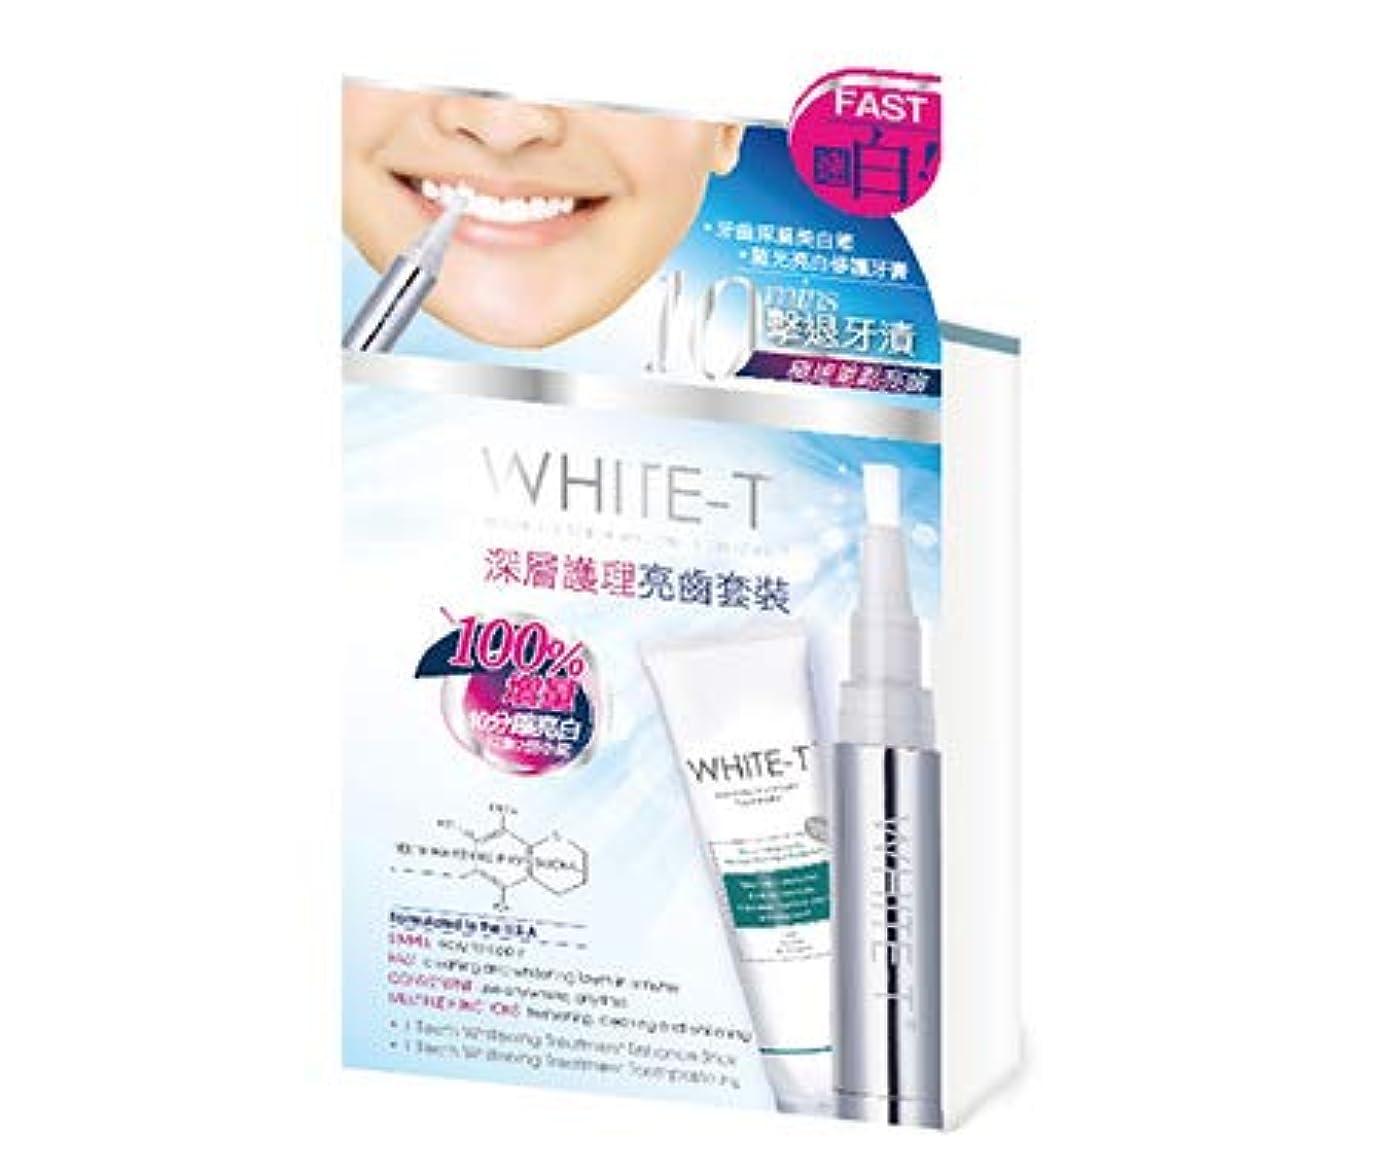 WHITE-T ホワイトニング ペンタイプ(4ml) +ホワイトニング歯磨き粉(30g) 並行輸入品